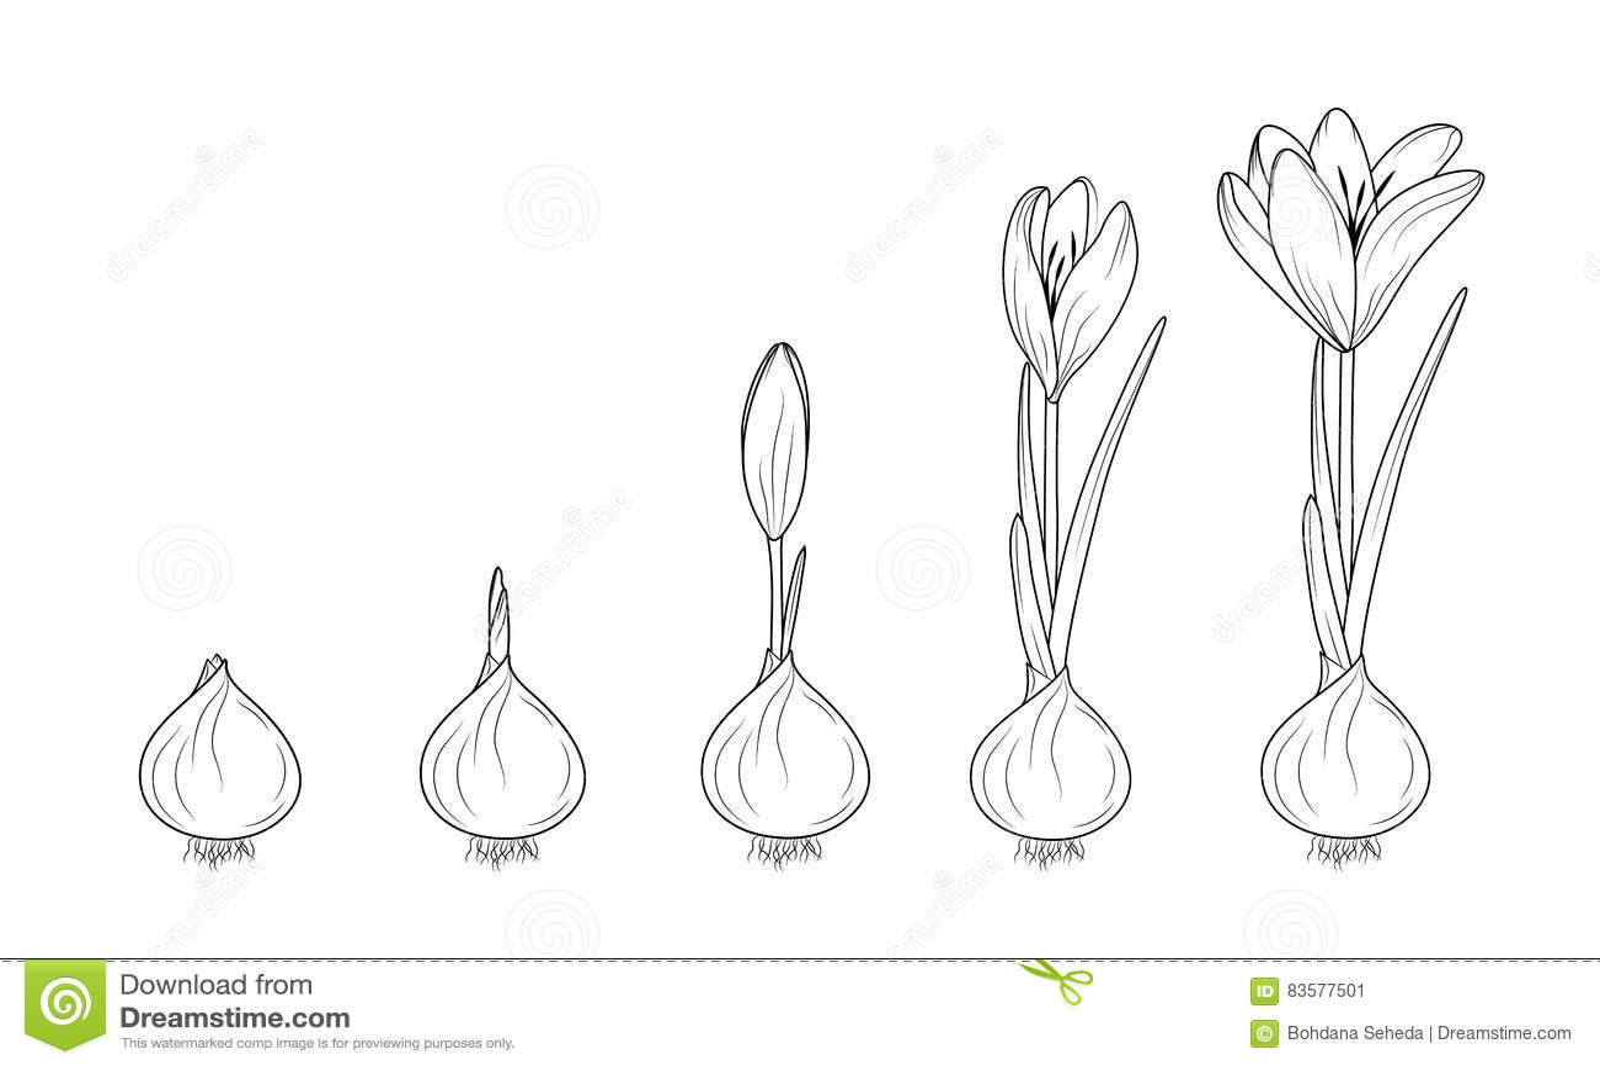 Plant Growth Diagram